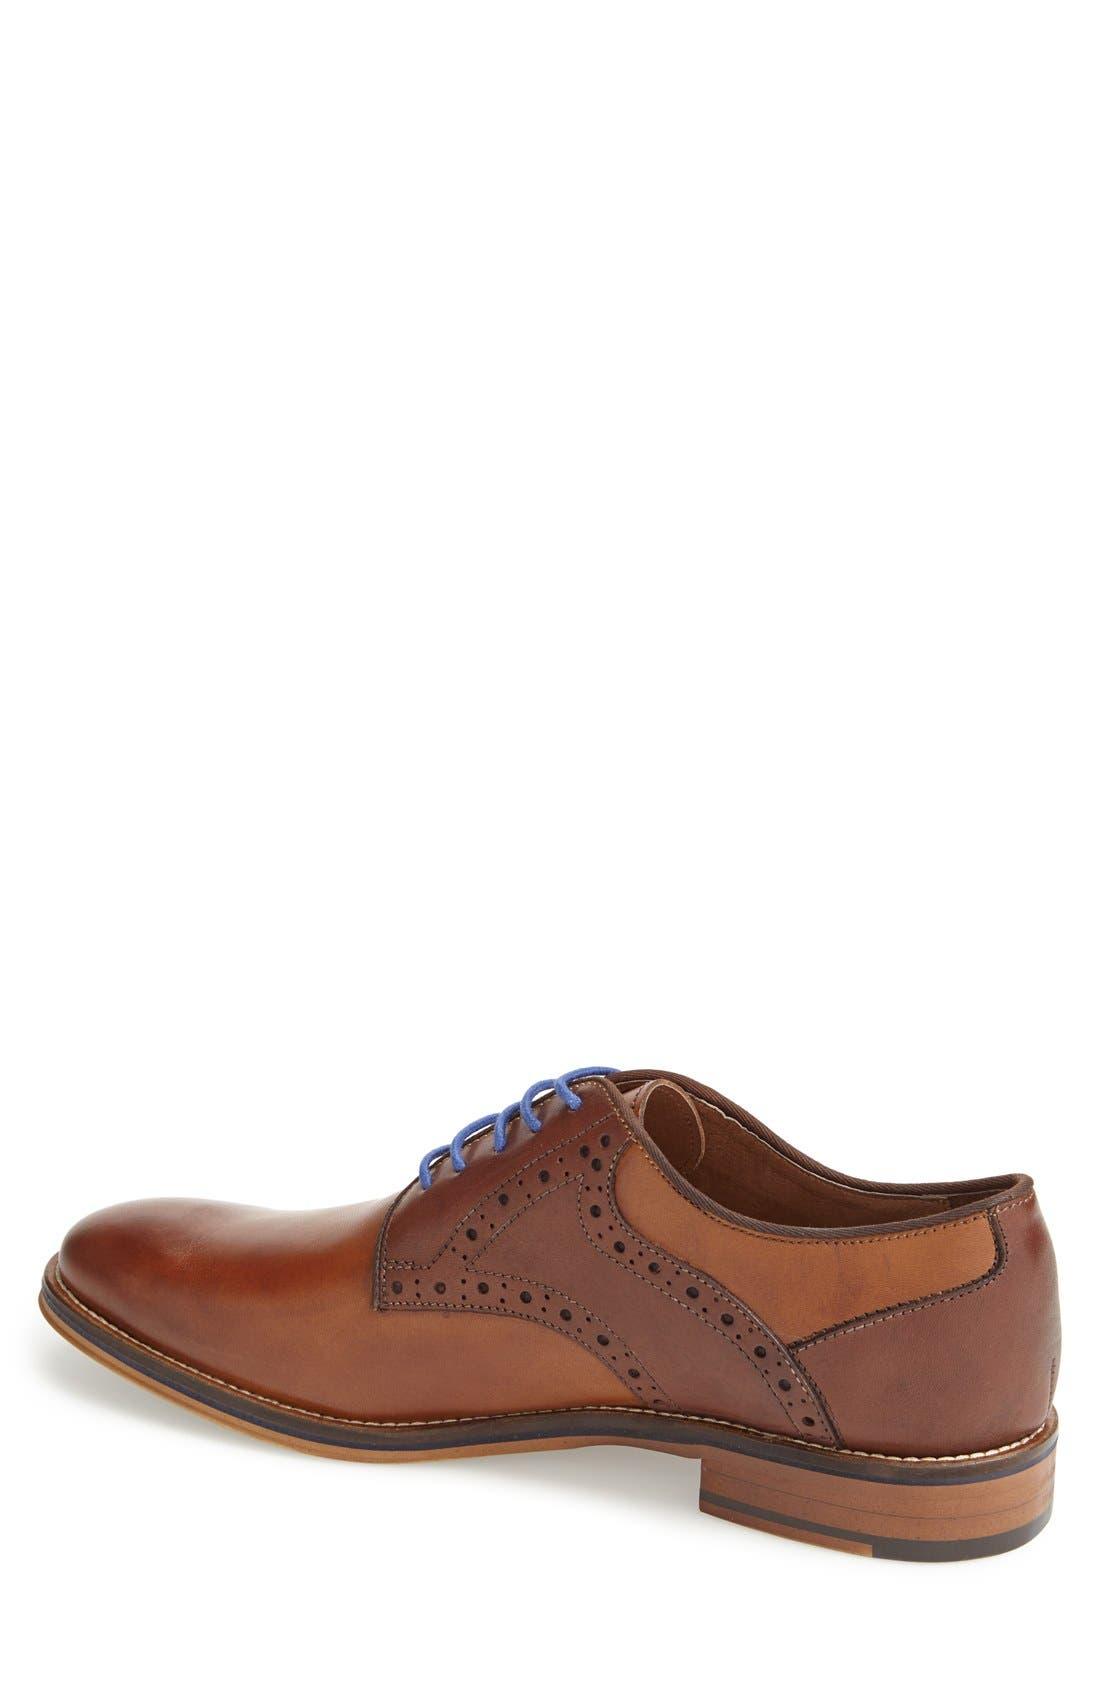 Conard Saddle Shoe,                             Alternate thumbnail 2, color,                             TAN/ DARK BROWN